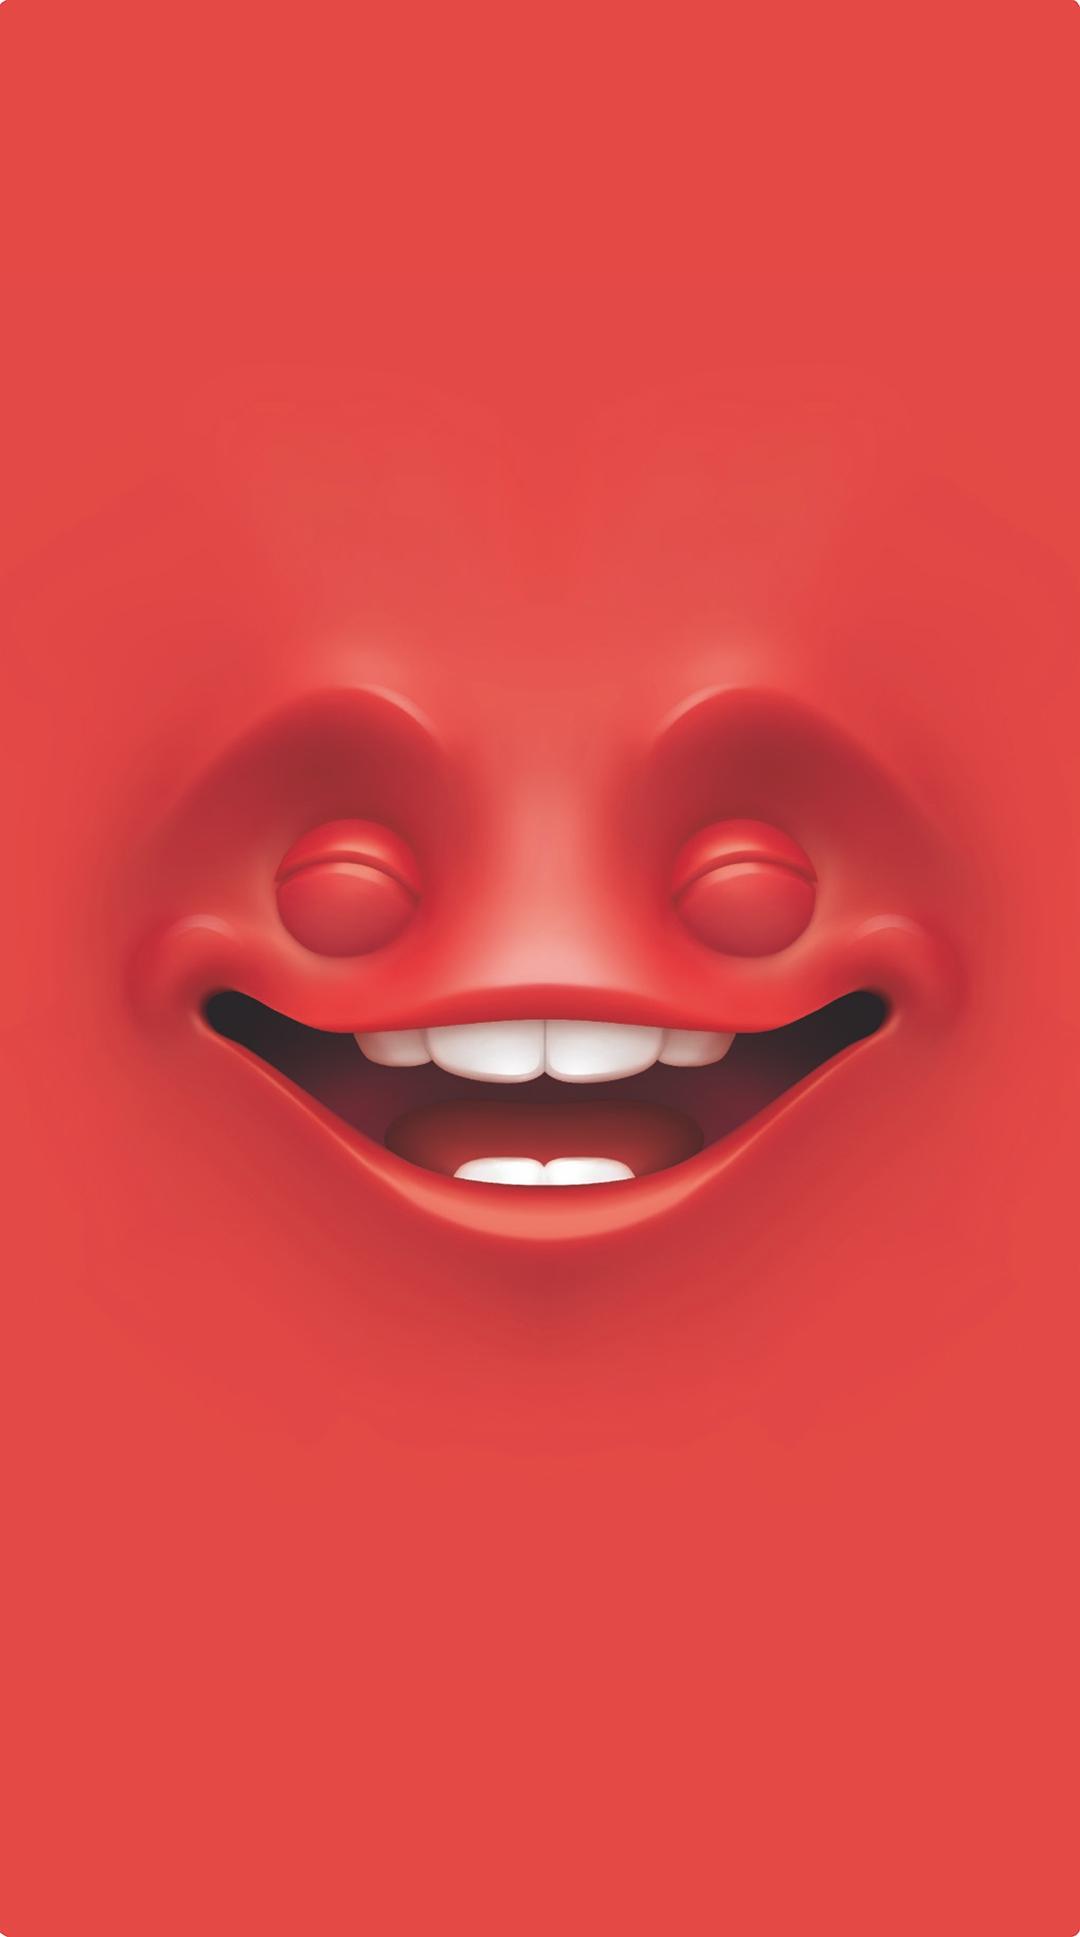 Red Emoji Wallpaper